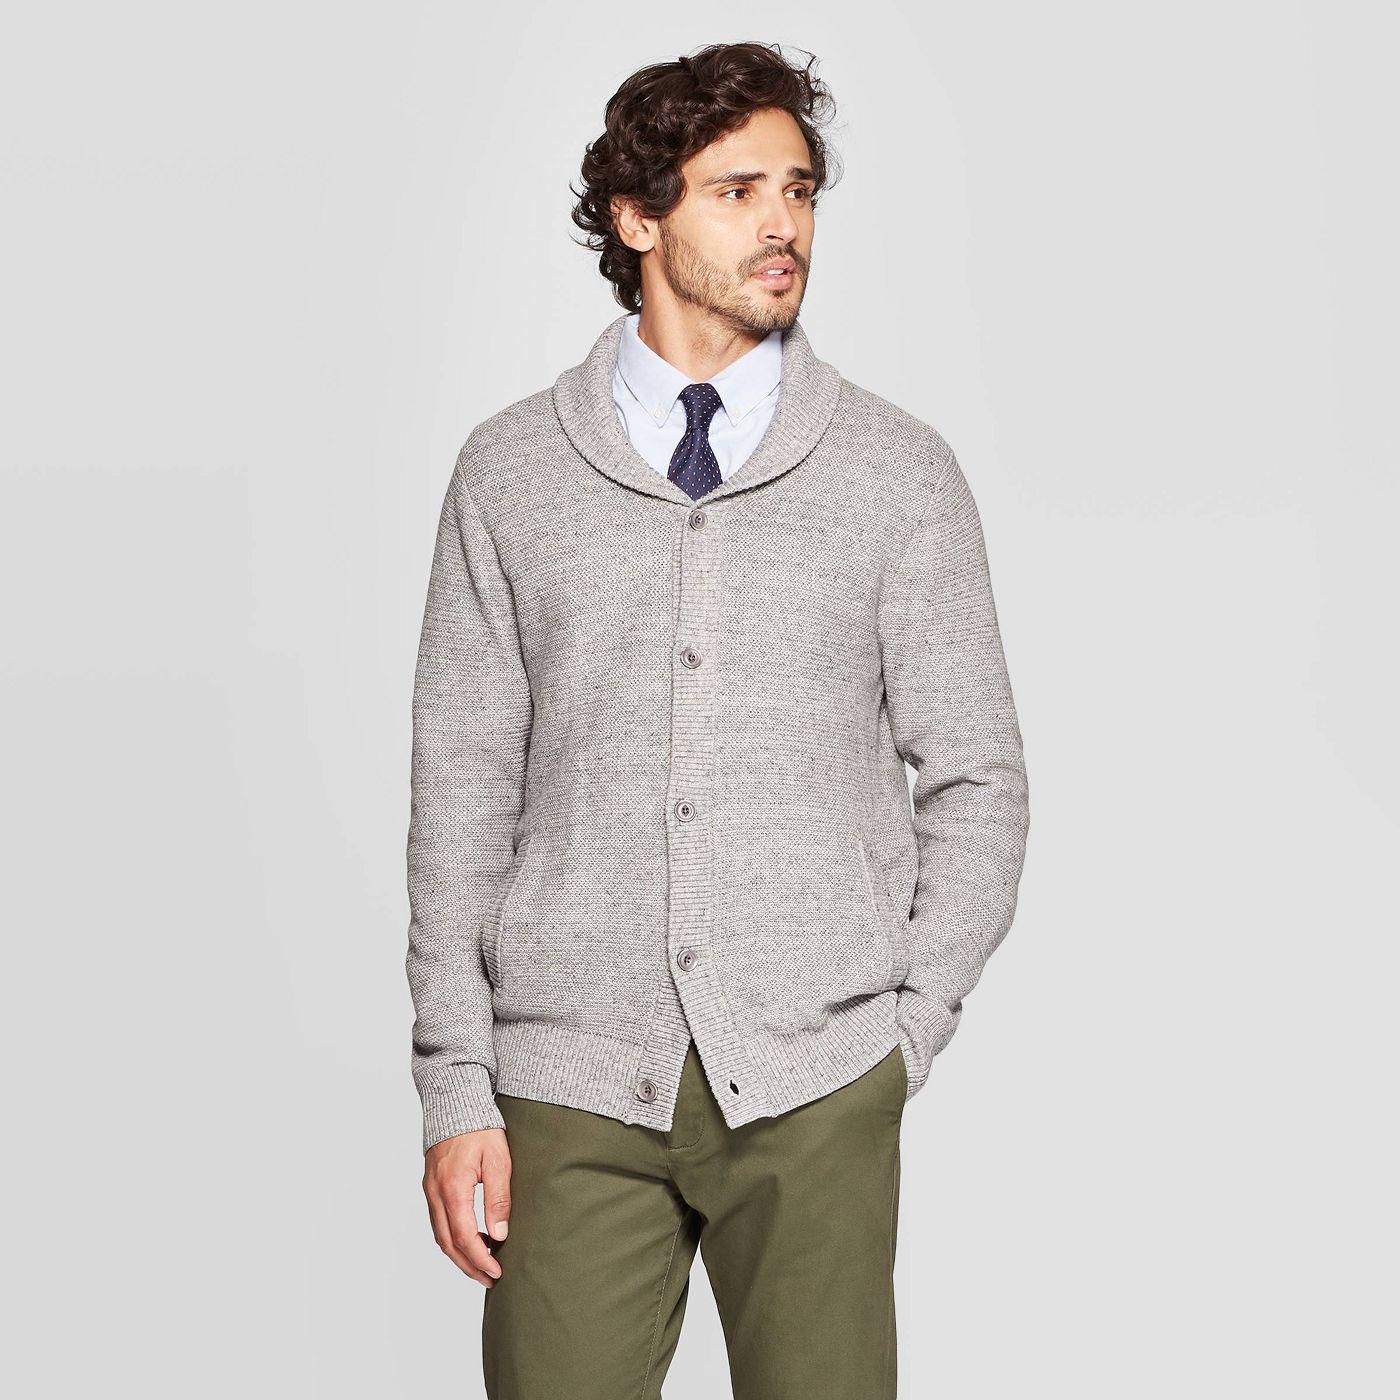 Men's Standard Fit Button-Up Mock Neck Sweater